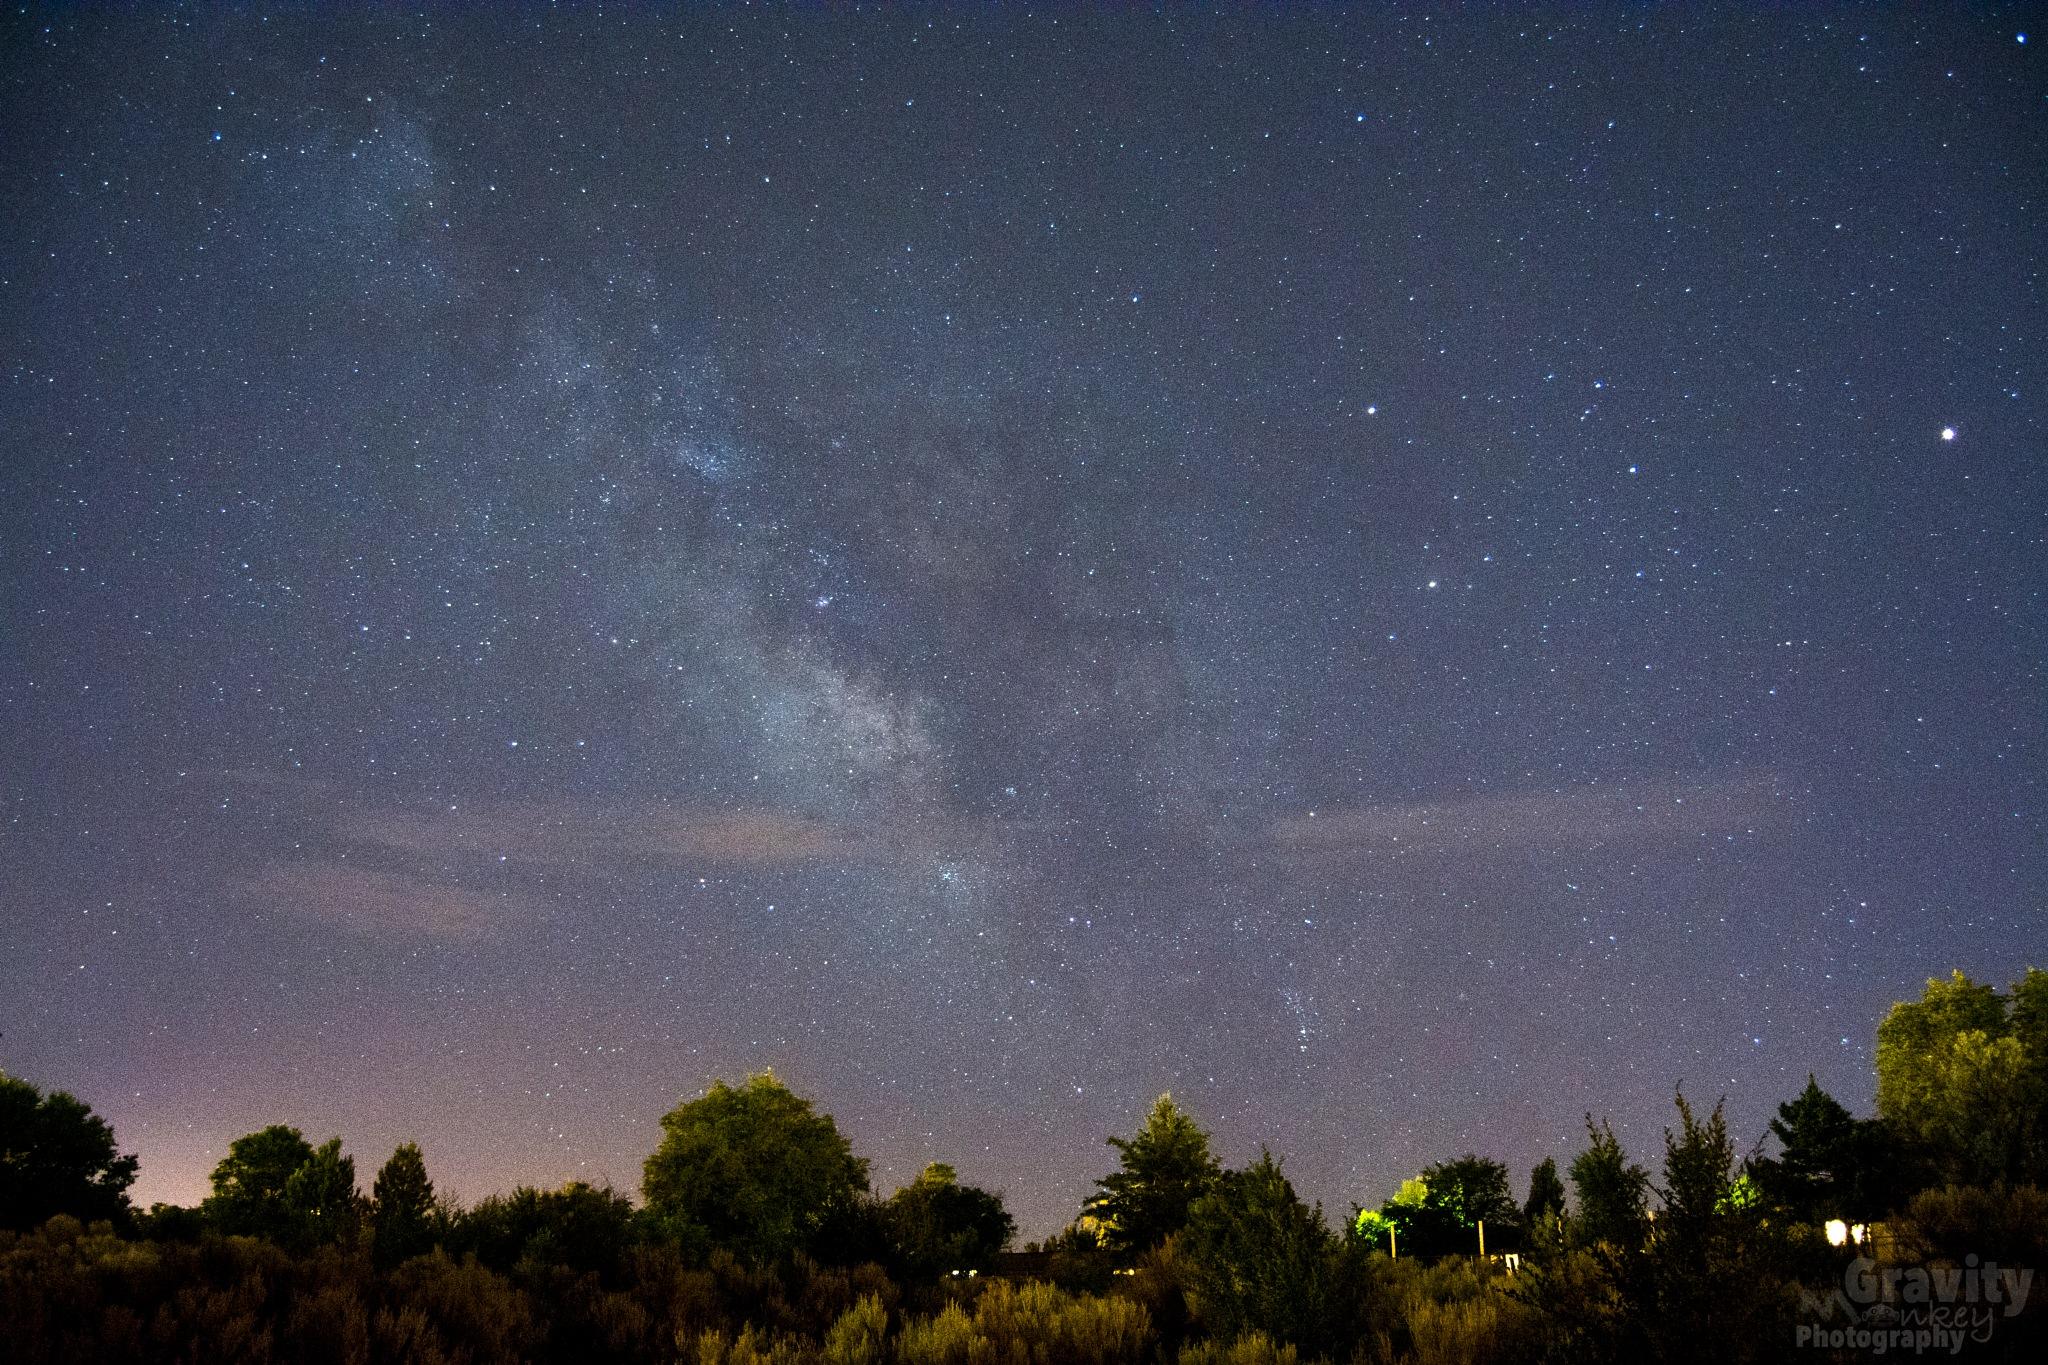 Santa Fe and the Milky Way by GravityMonkeyPhotography